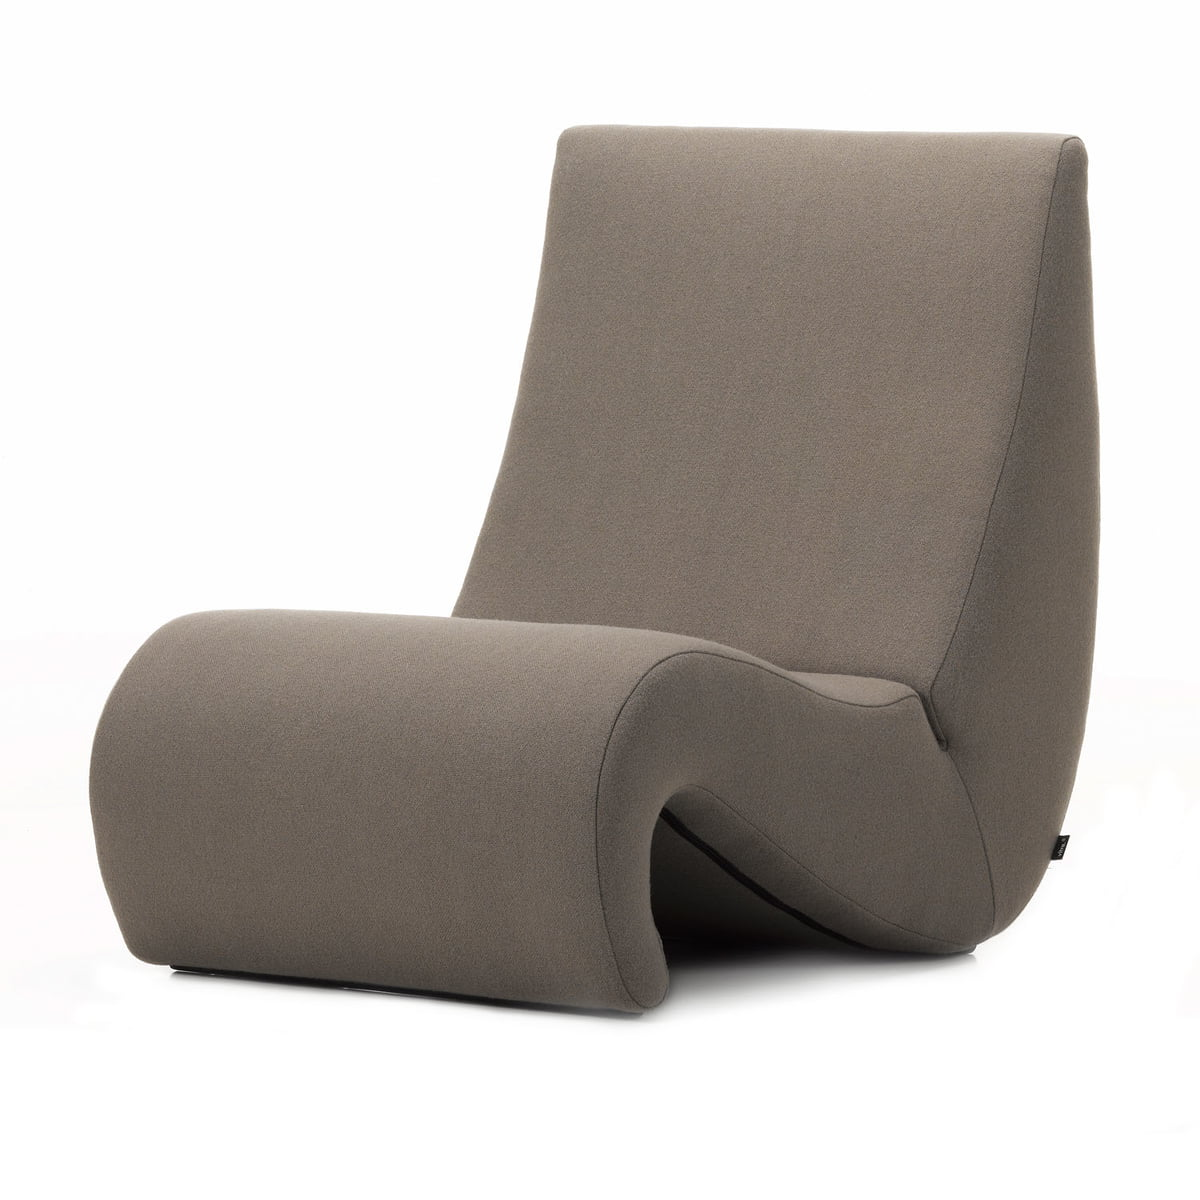 Amoebe Sessel Von Vitra Im Wohndesign Shop